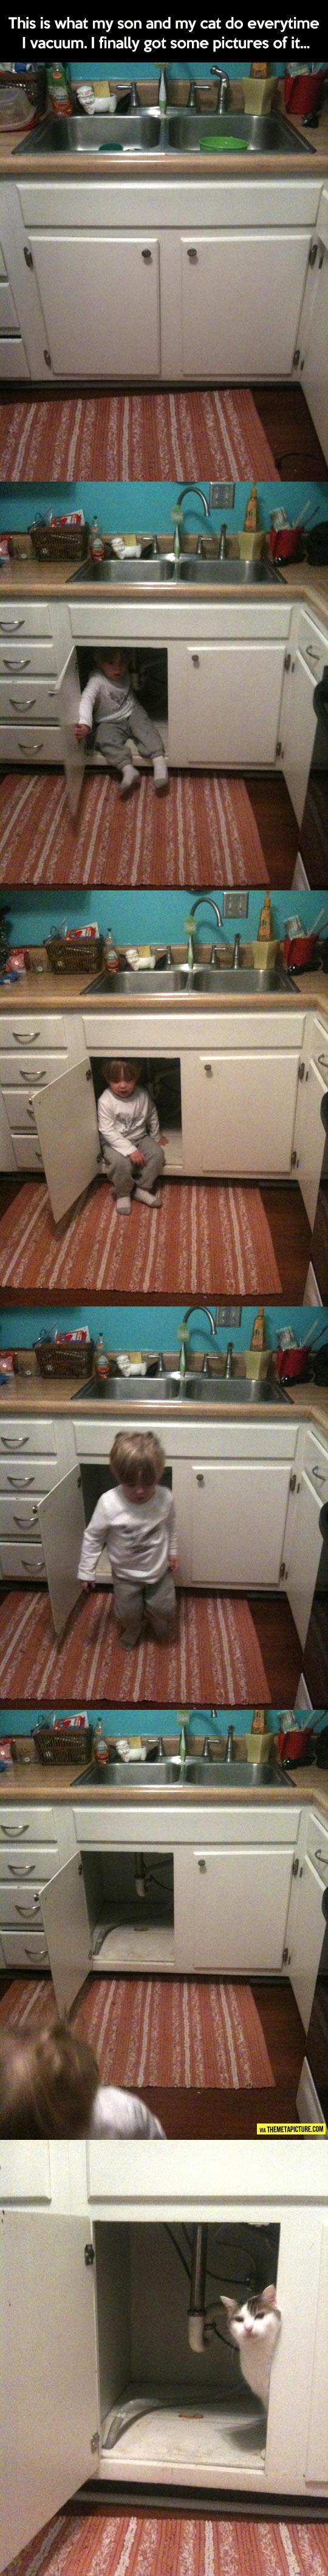 cool-vacuum-child-kid-cat-cupboard-hideout